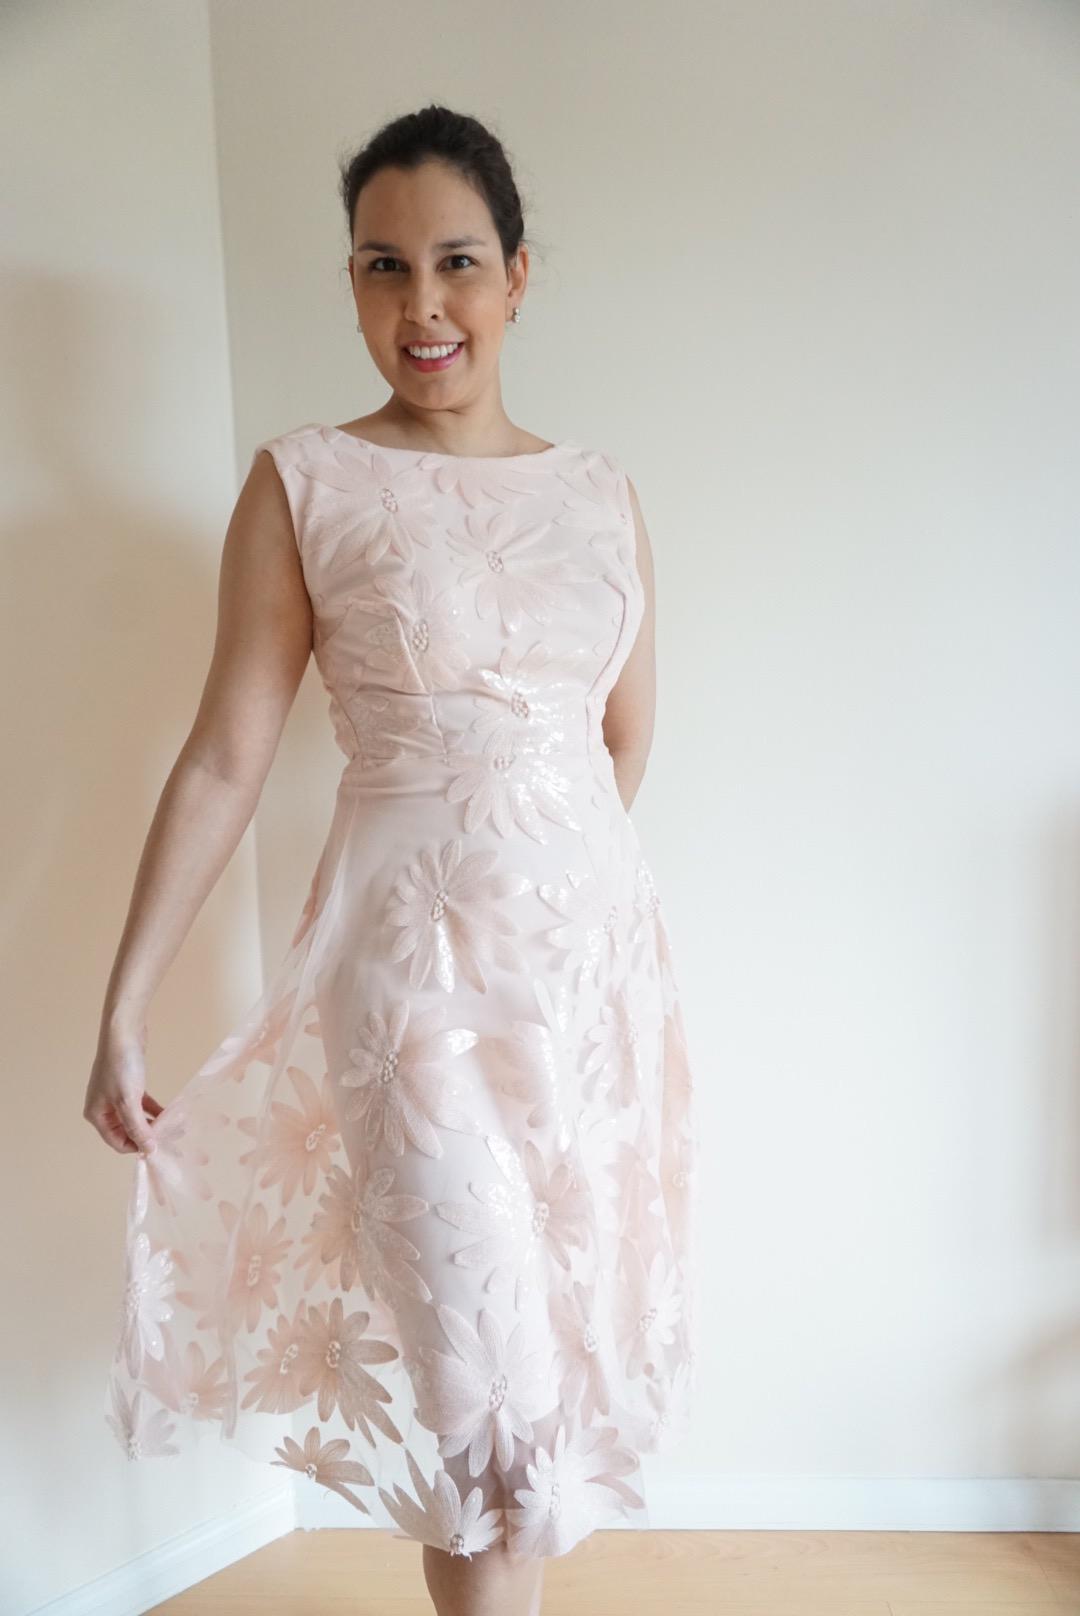 Geschichten eines Ballkleides Simplicity 4744 – The Dressmaker\'s Ball